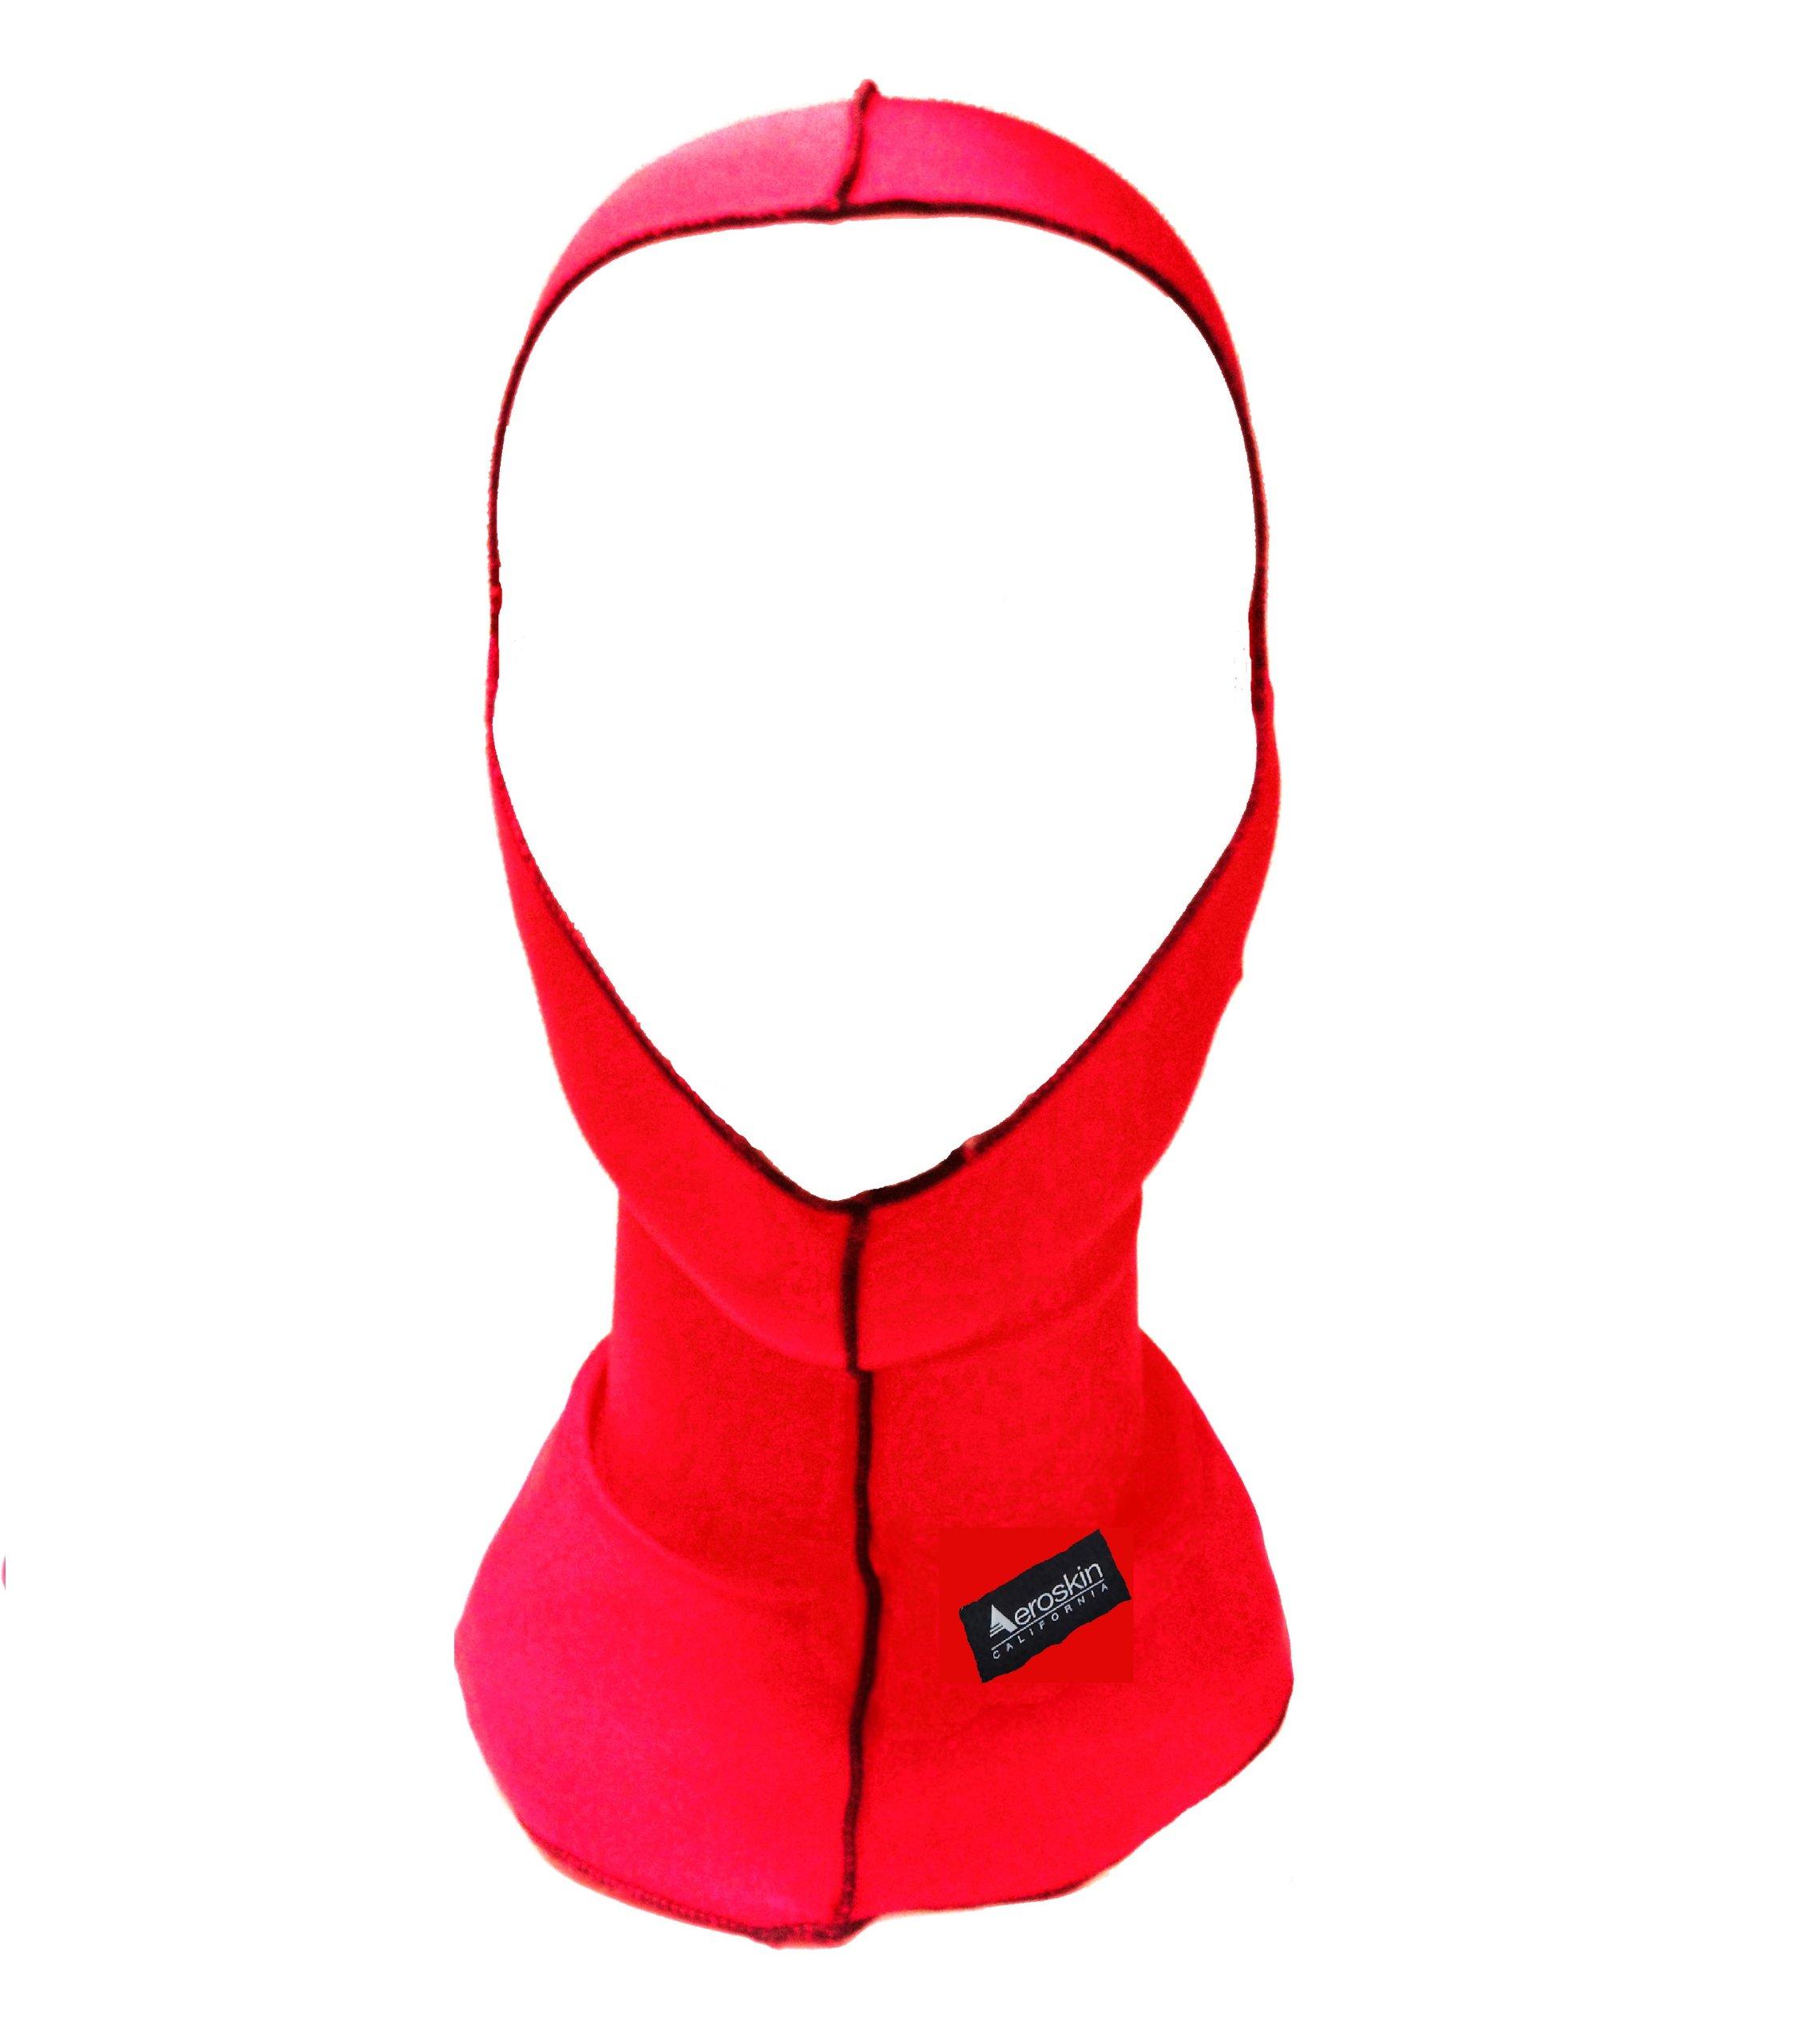 Aeroskin Nylon Spandex Solid Hood, Red by Aeroskin (Image #1)